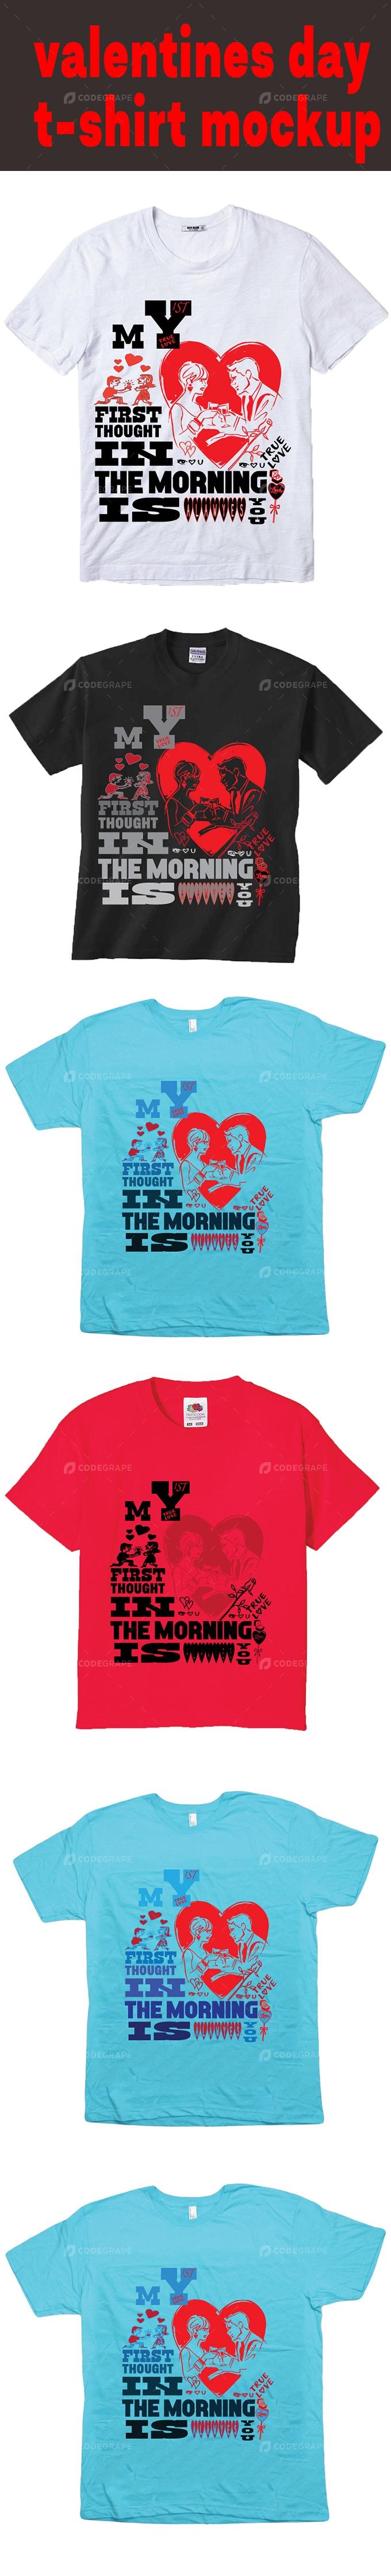 Valentines Day T-shirt Mockup